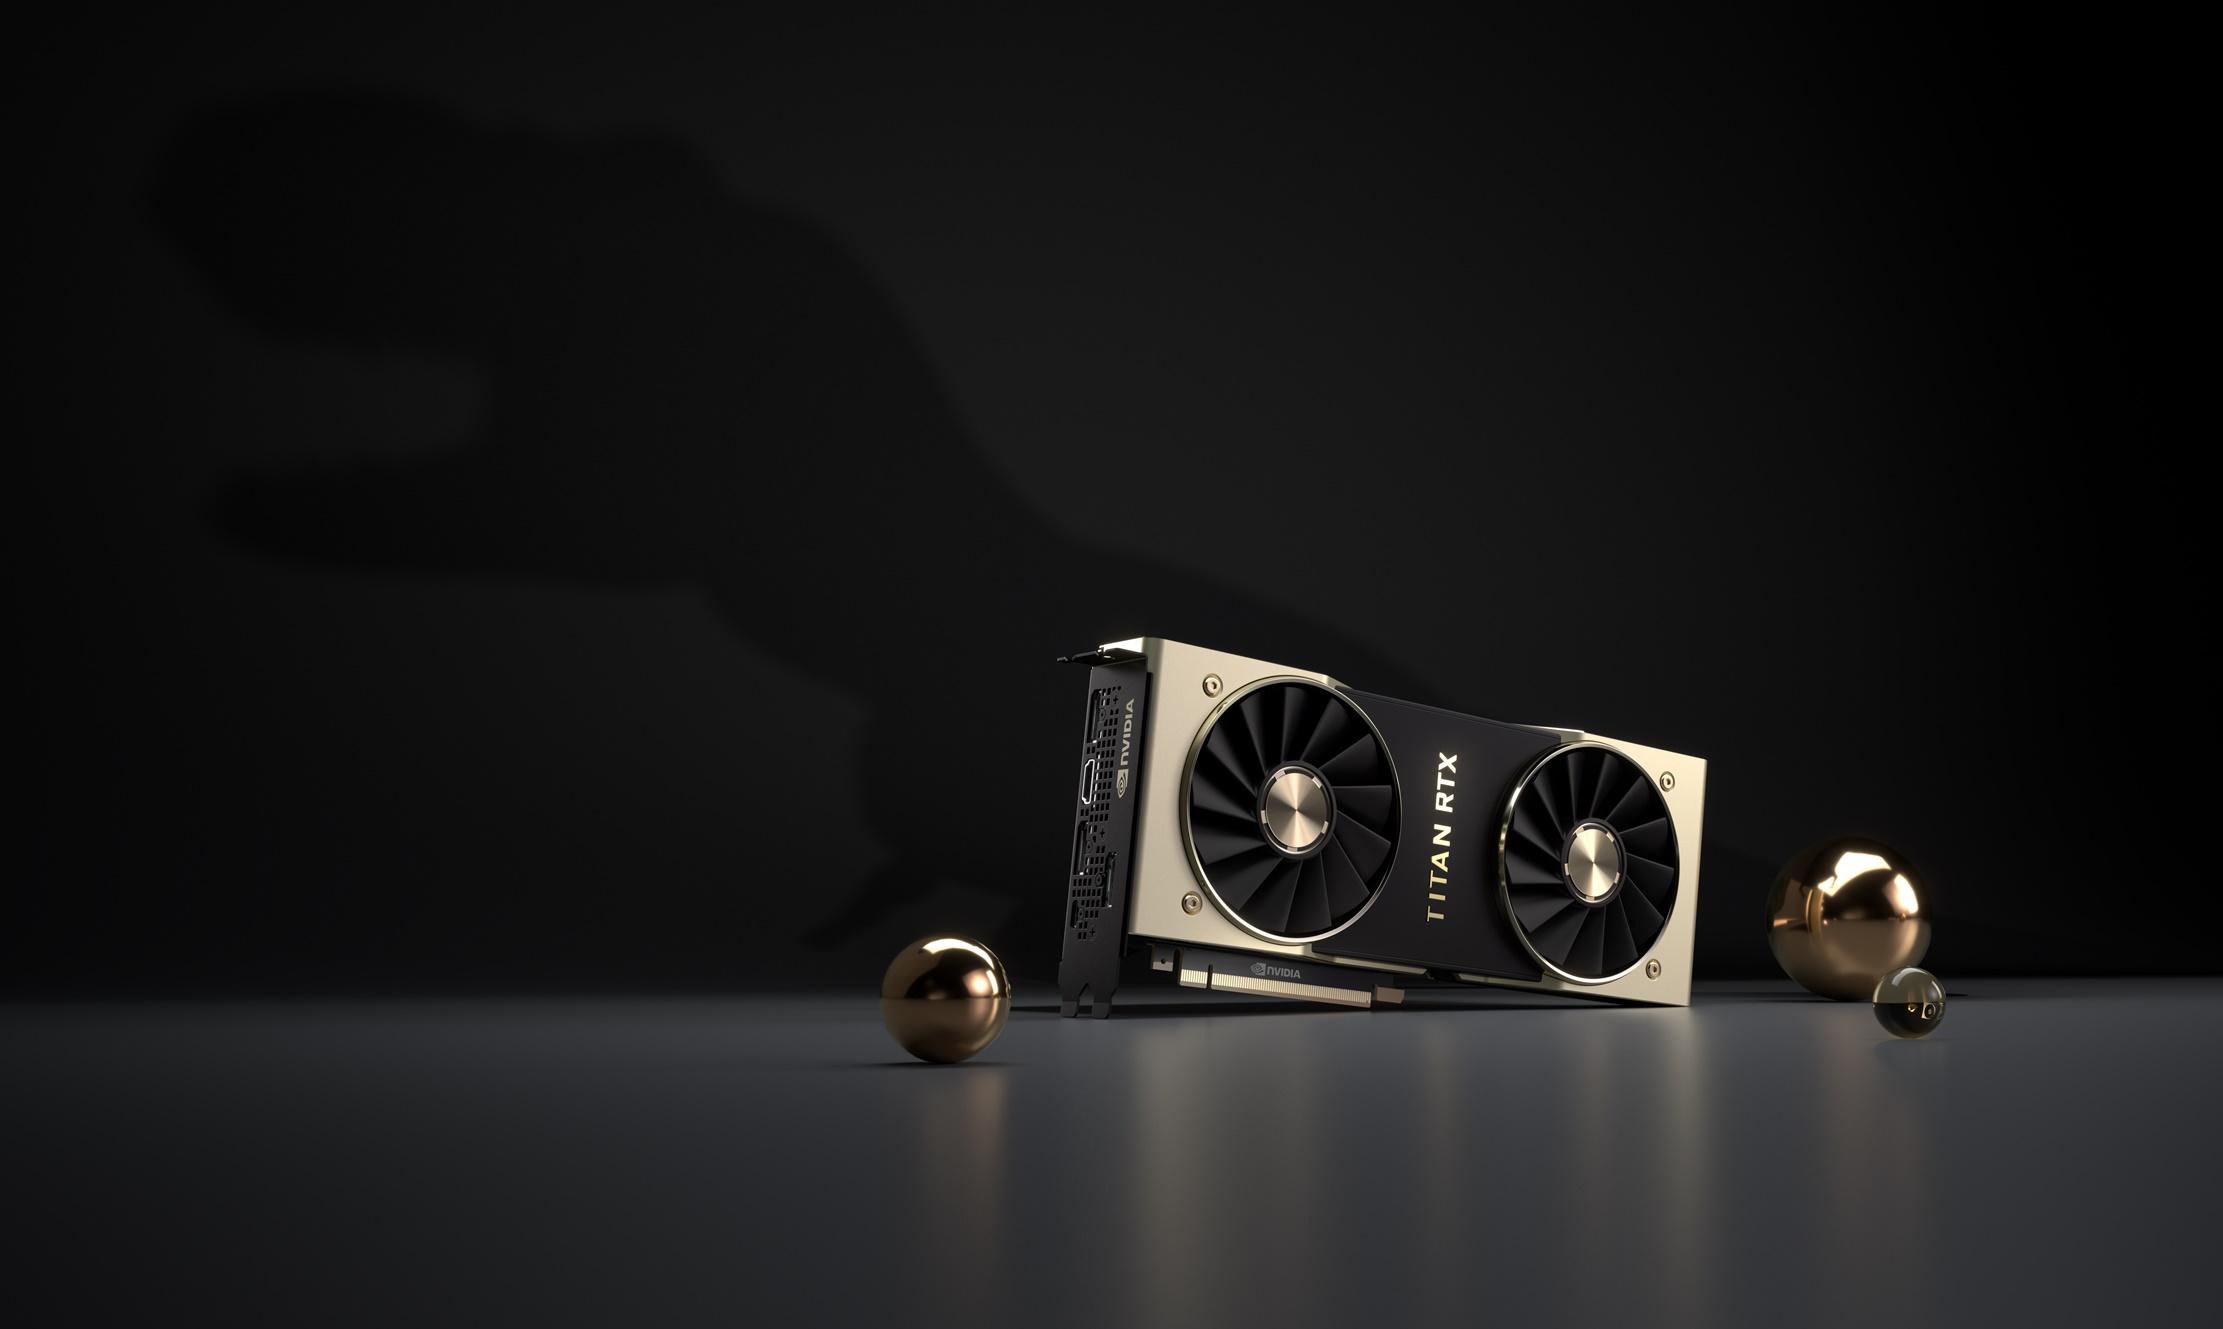 titan rtx t rex NVIDIA เปิดตัว NVIDIA TITAN RTX ยักษ์ใหญ่ในสถาปัตย์ Turing ตัวแรงรุ่นใหม่ล่าสุด